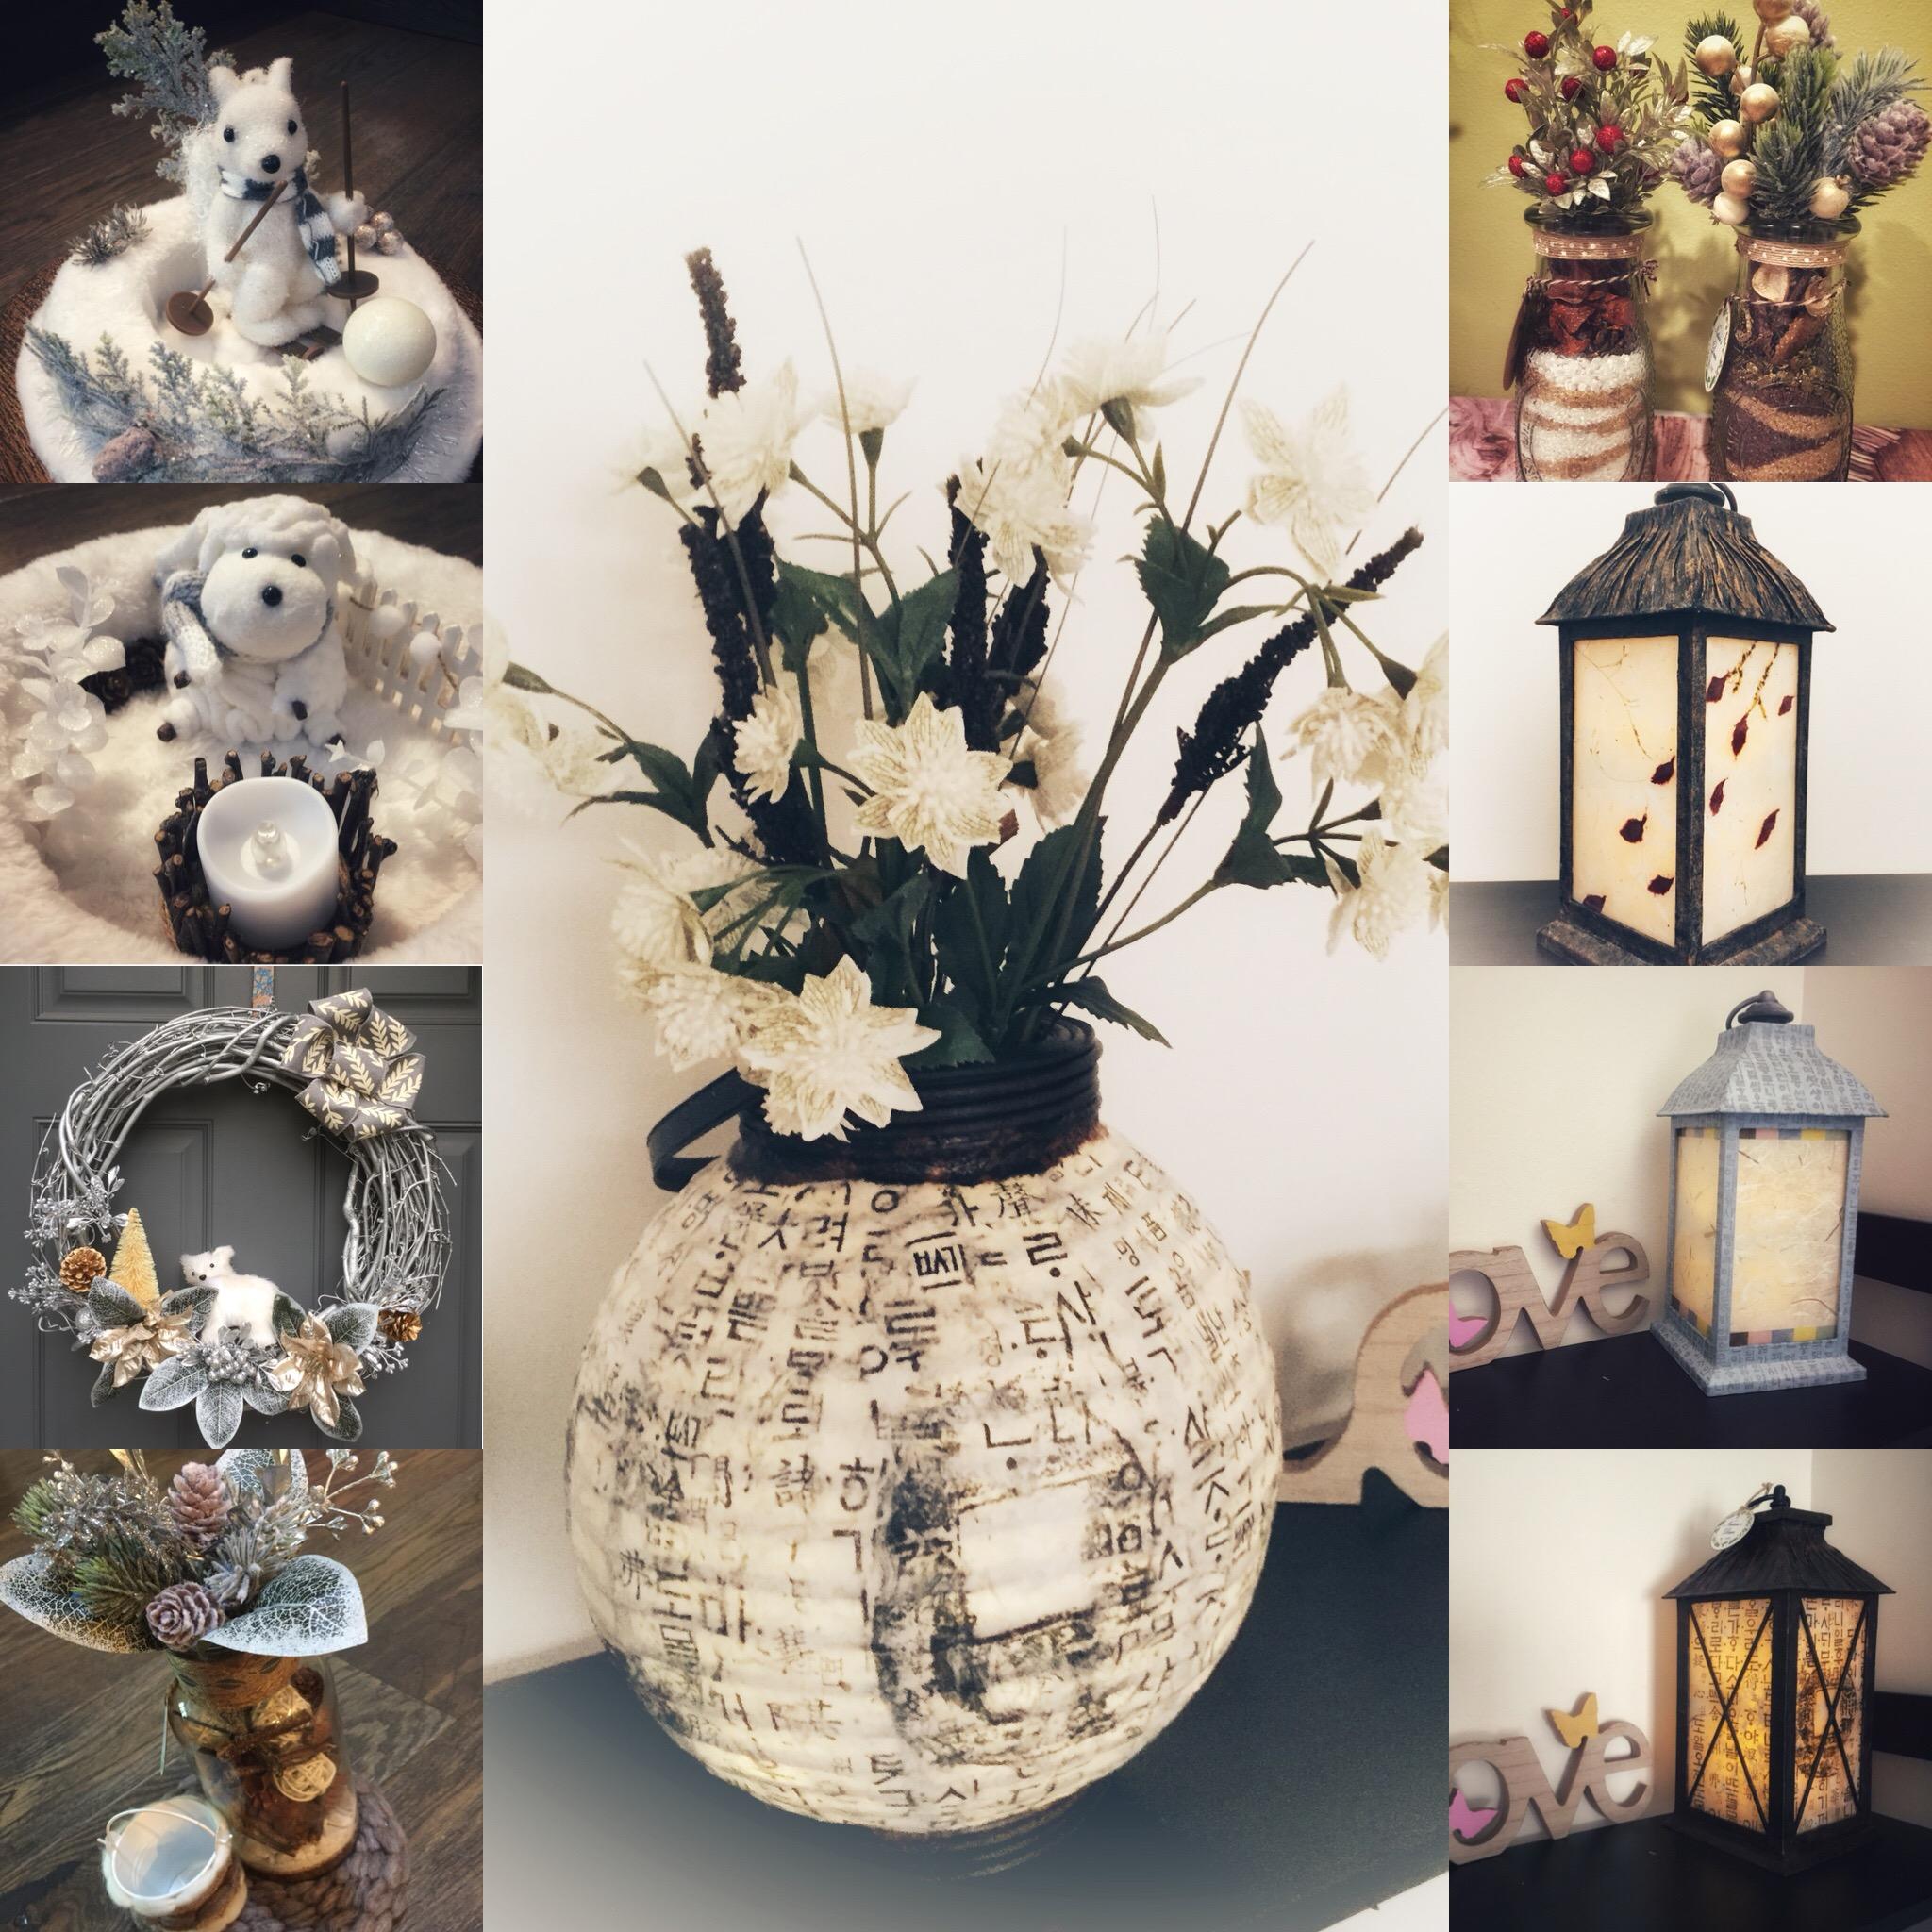 Nature's Decor - Traditional Korean Paper art (Lanterns & Vases), Seasonal decoration ( floral, wreaths, centerpieces)https://www.instagram.com/irisjw00/